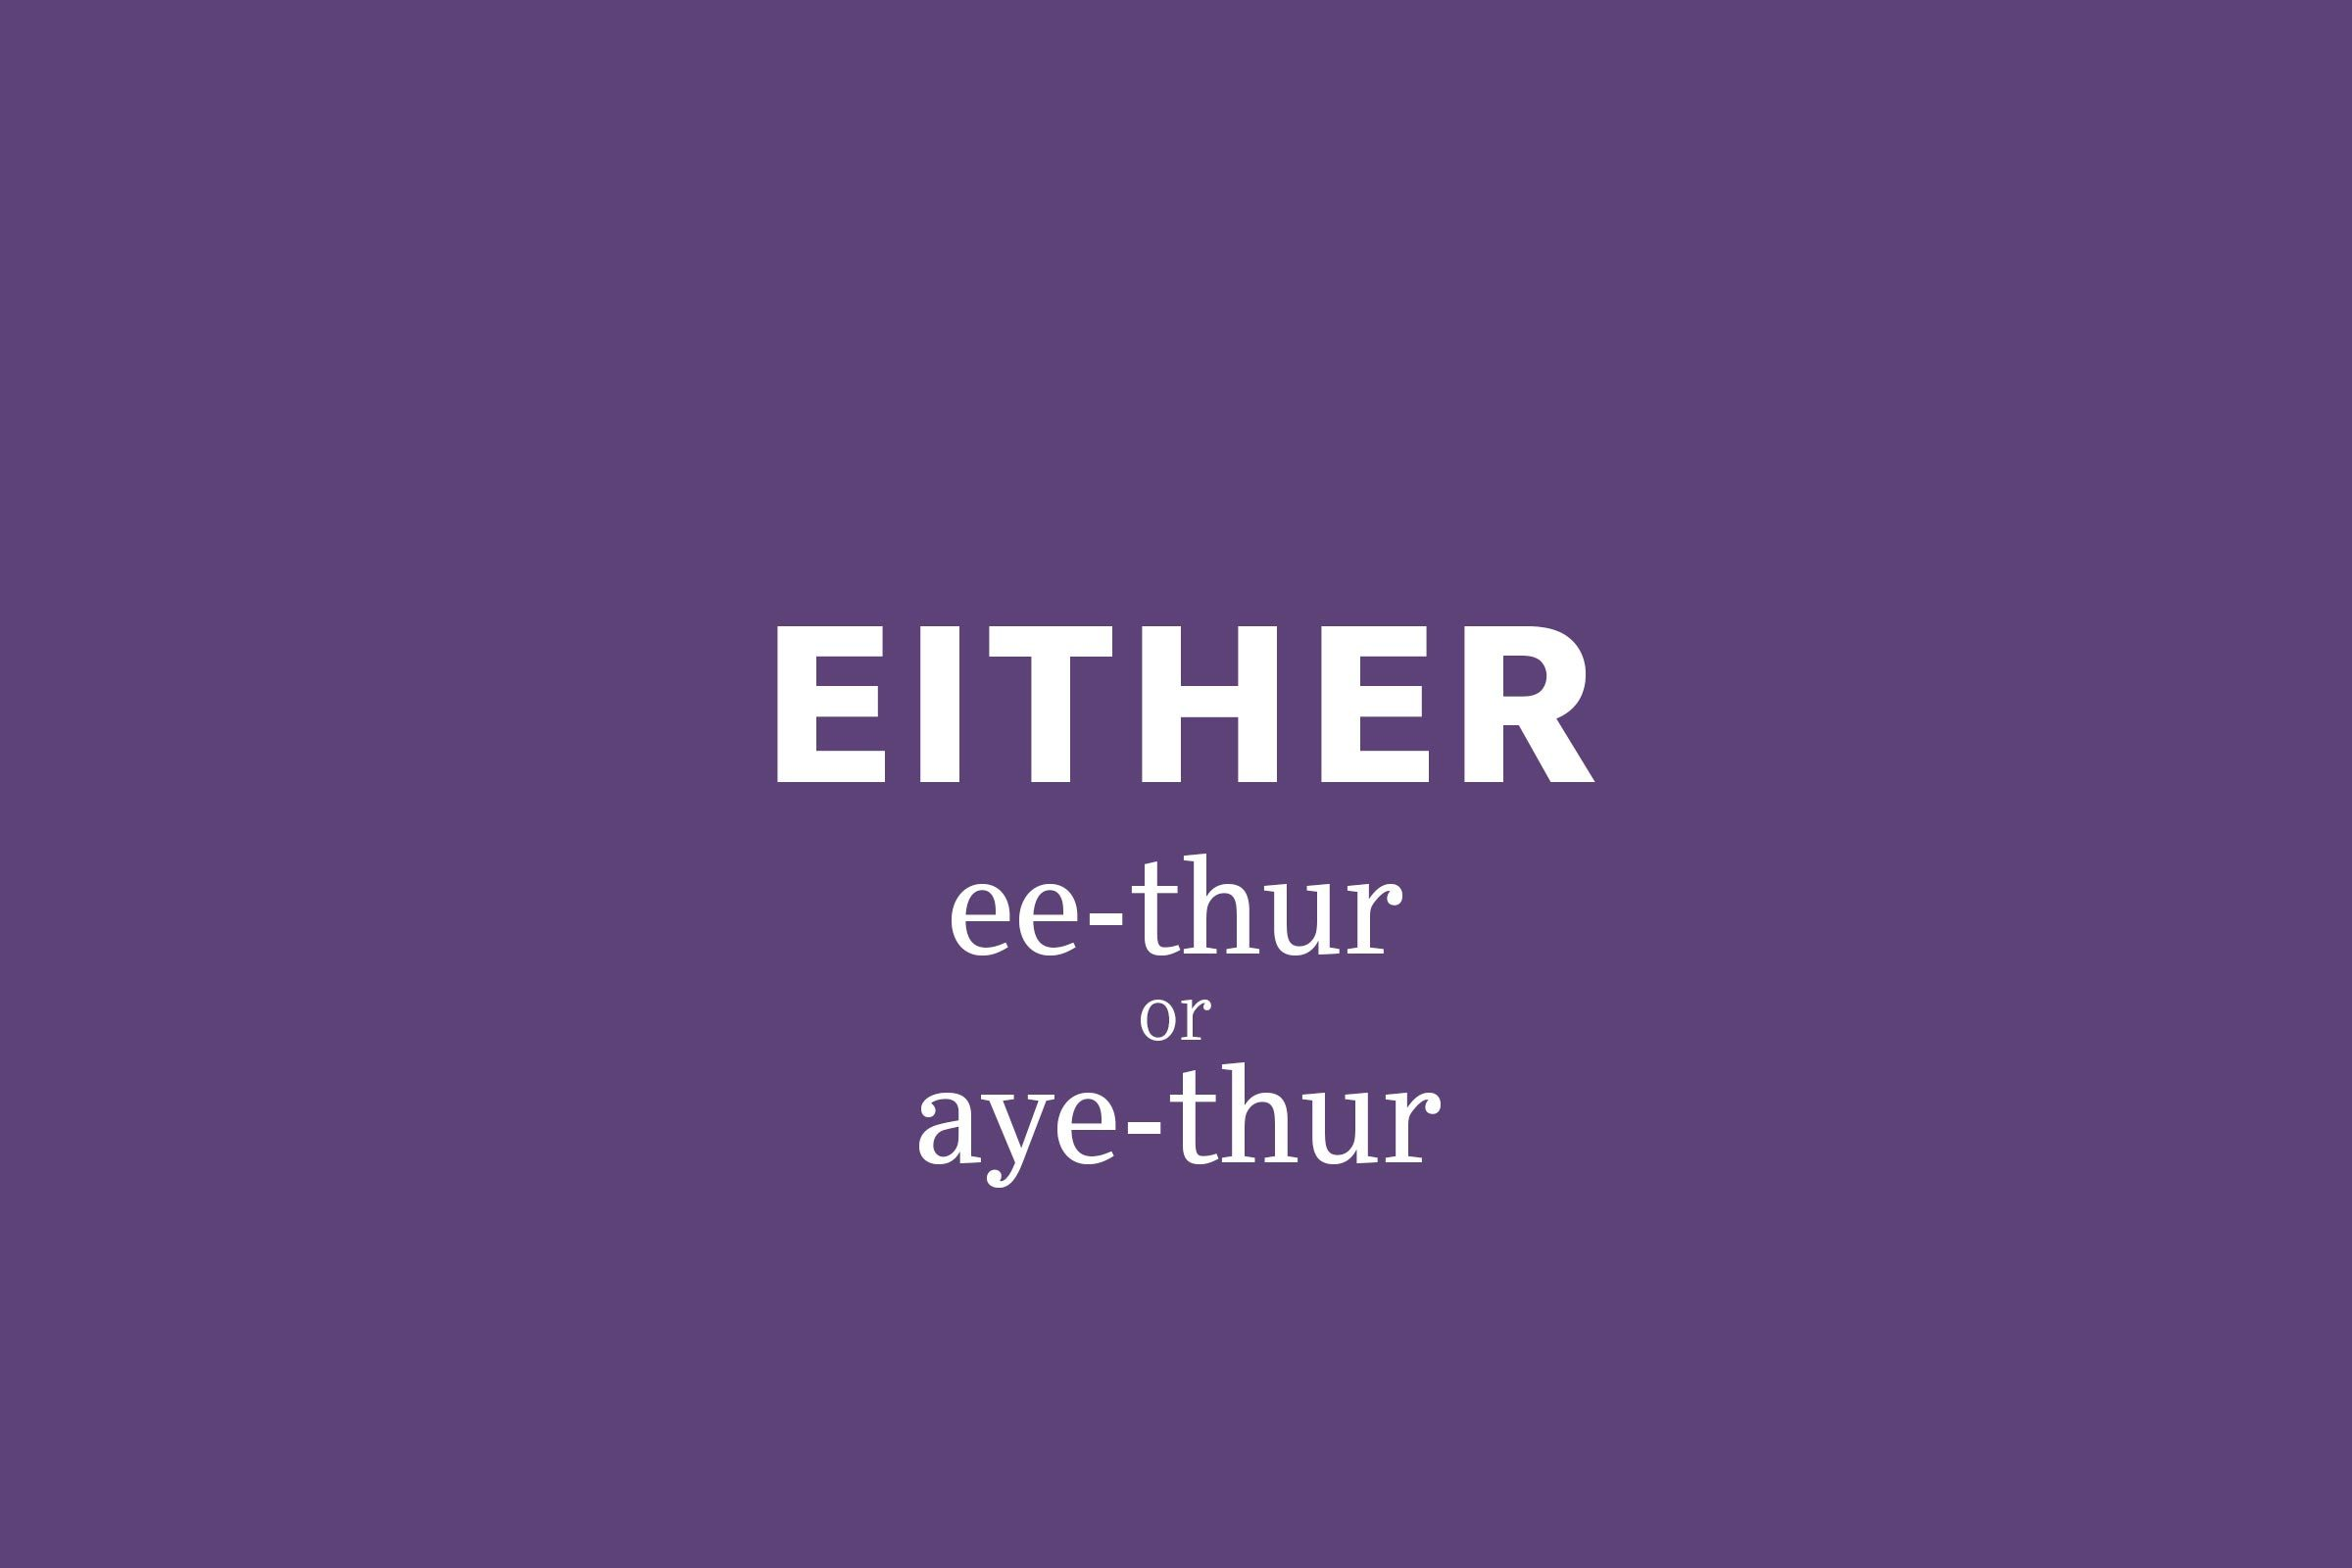 either pronunciation